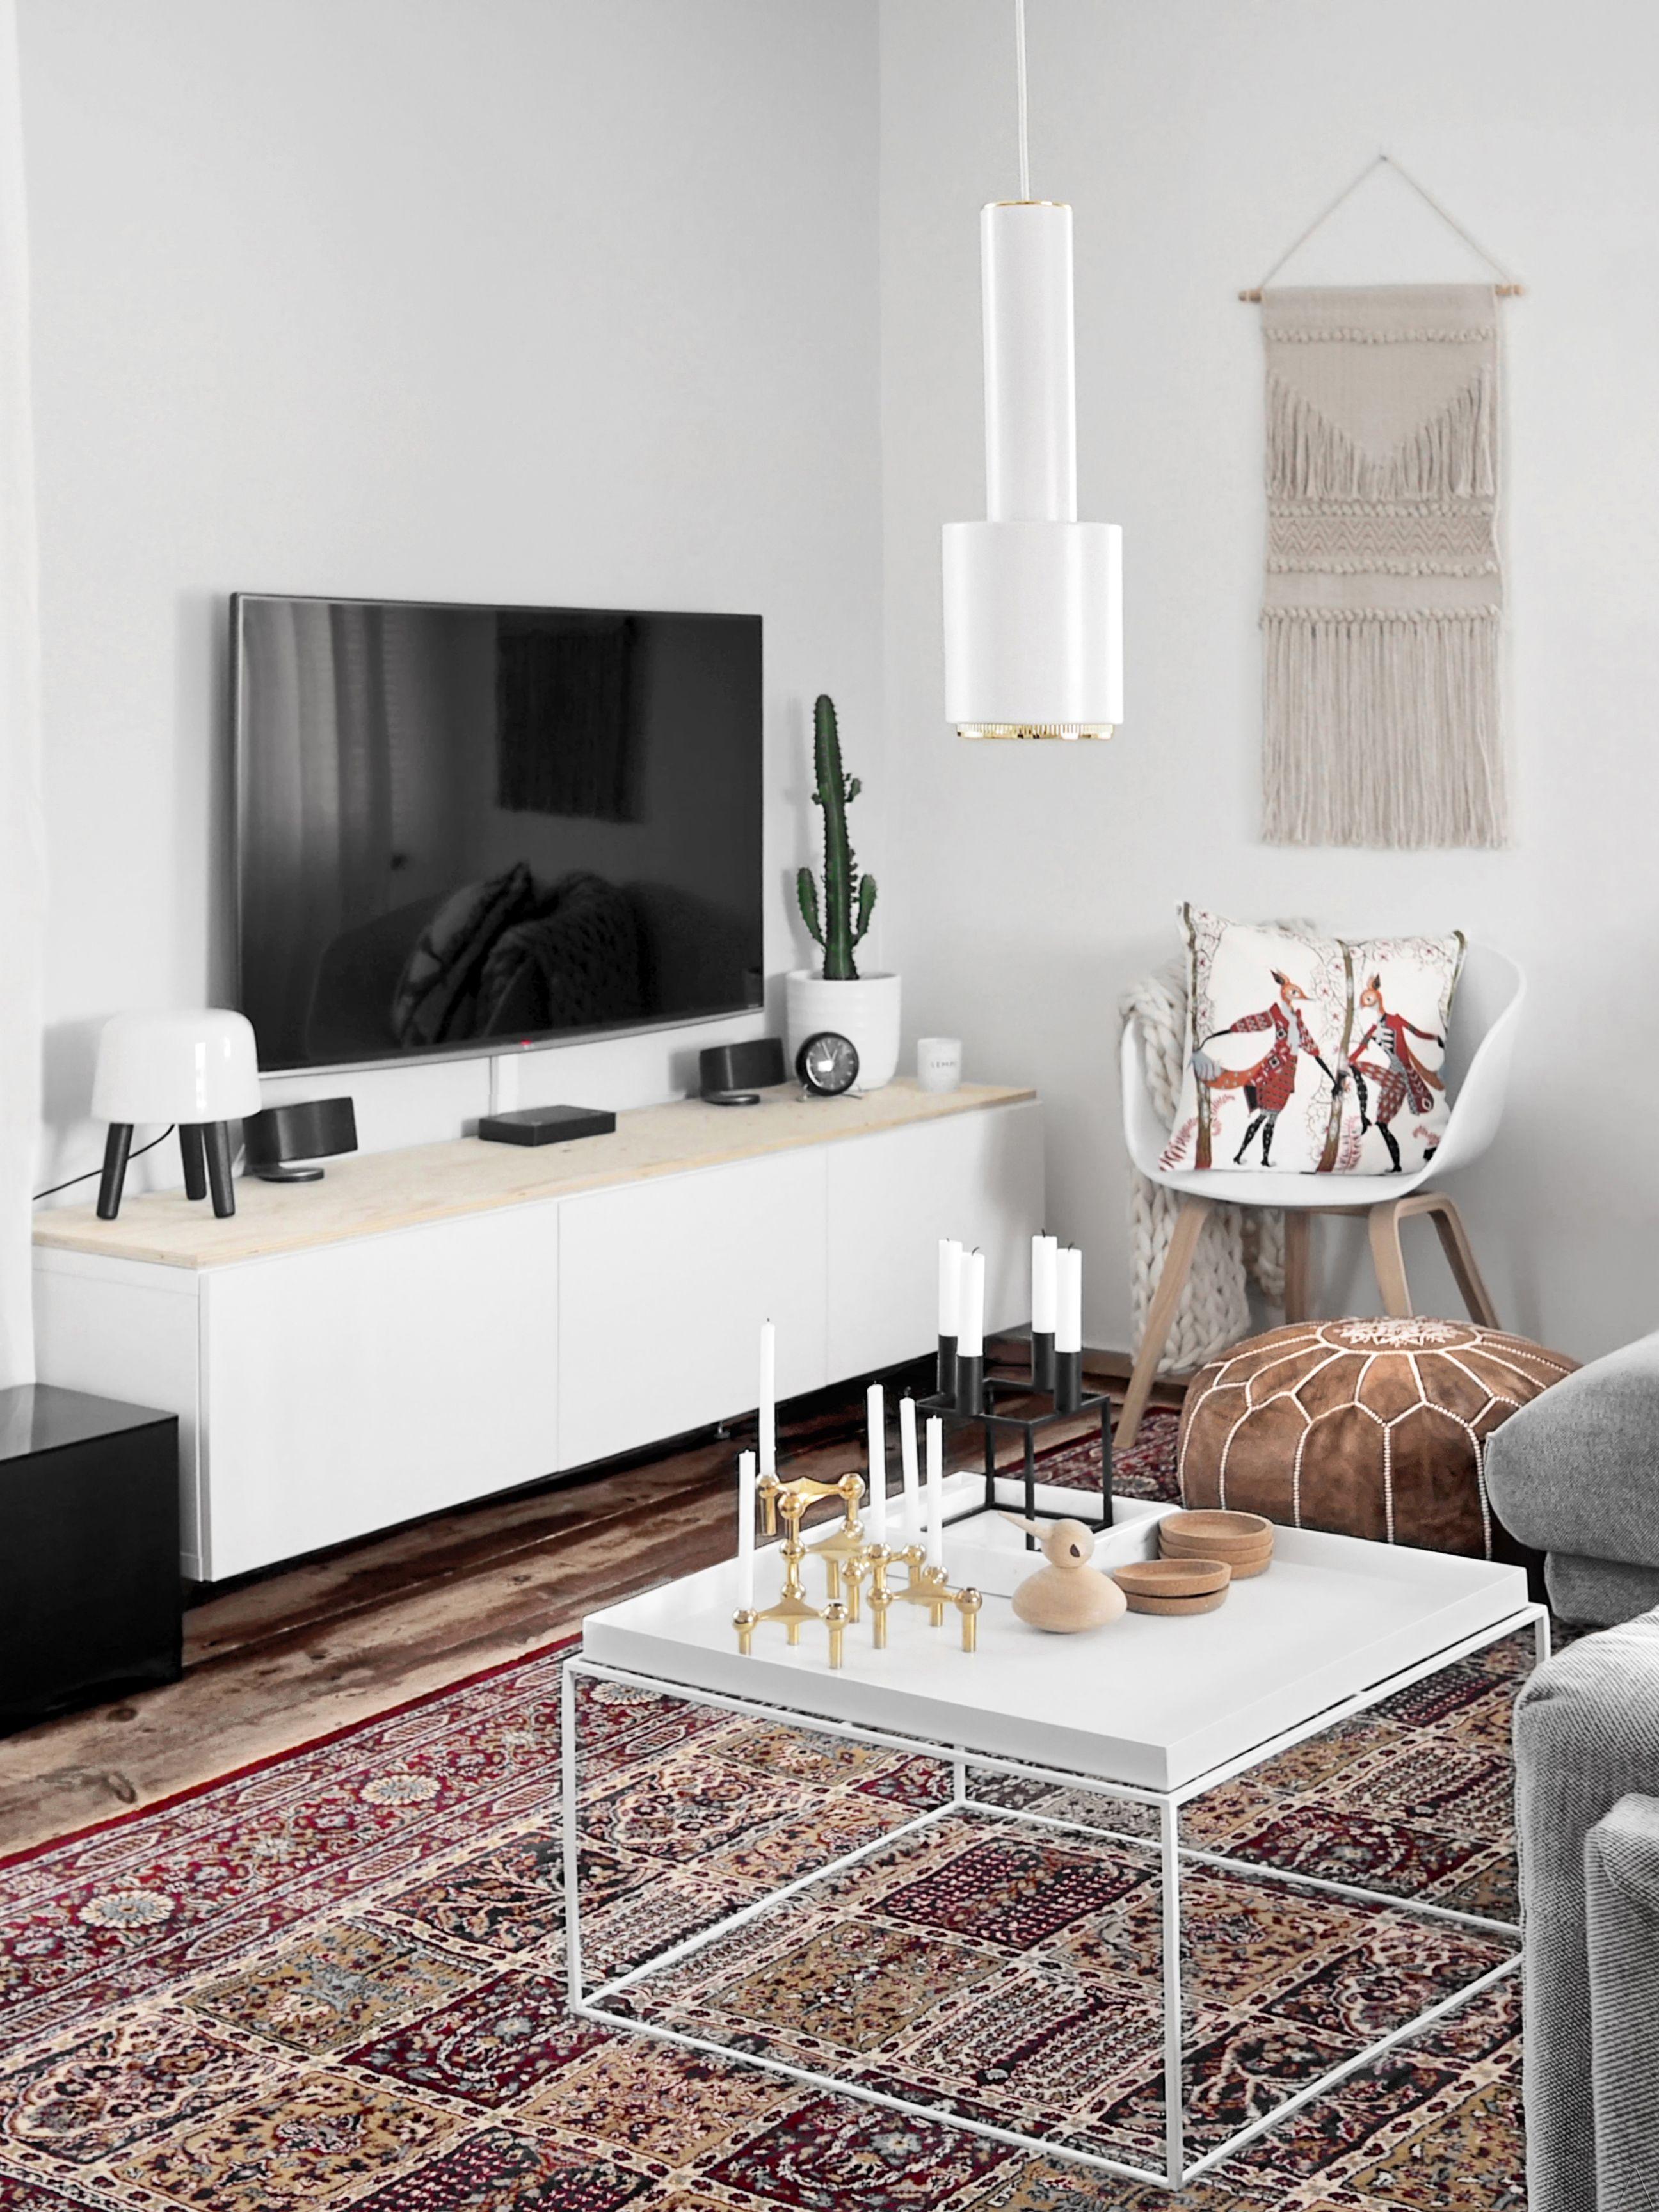 Our Livingroom Flat Decor Rugs In Living Room Ikea Rug